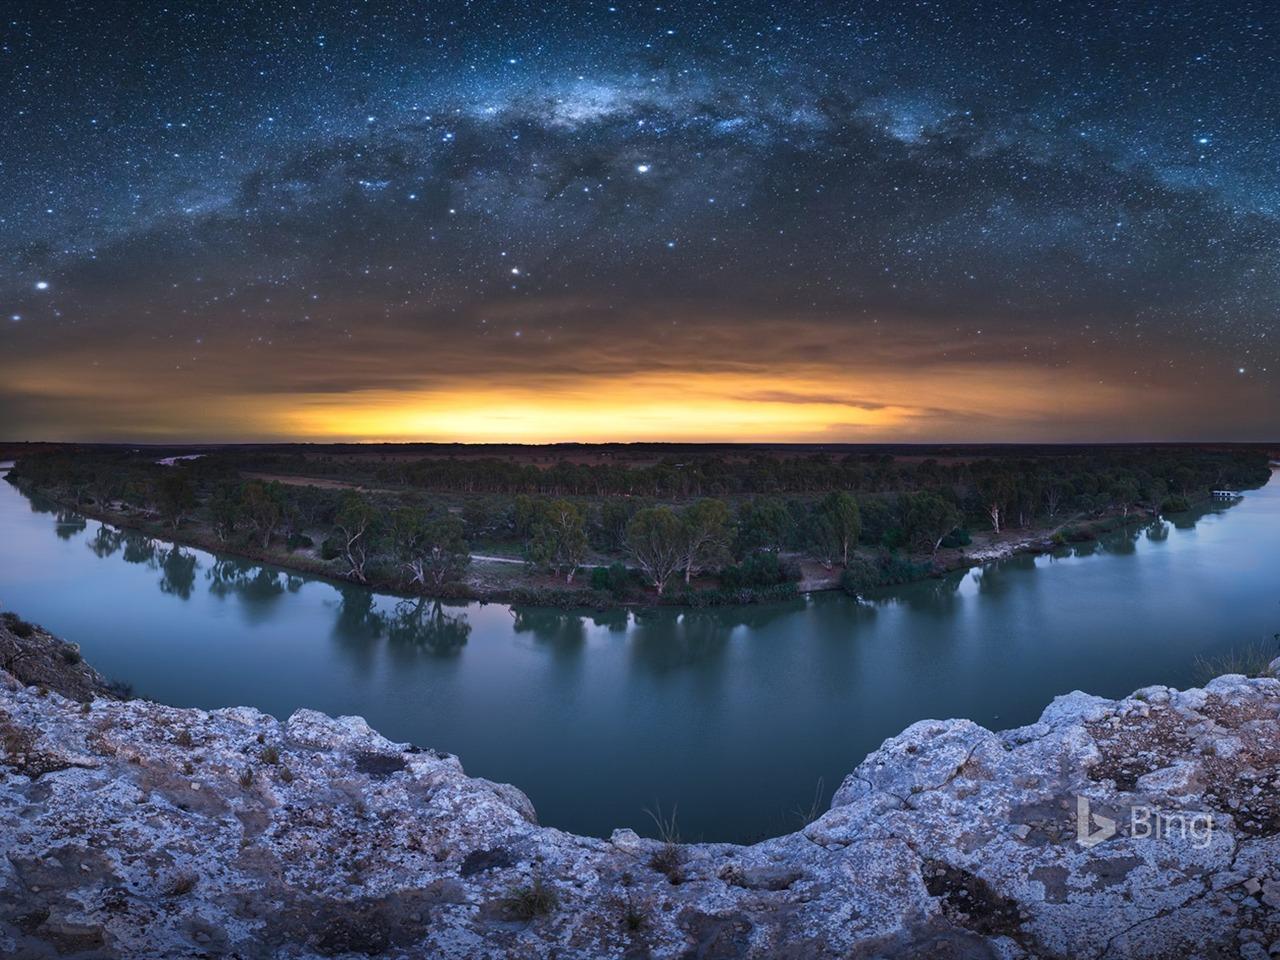 Os X Mavericks Wallpaper Iphone Milky Way Over Murray River 2018 Bing Desktop Preview